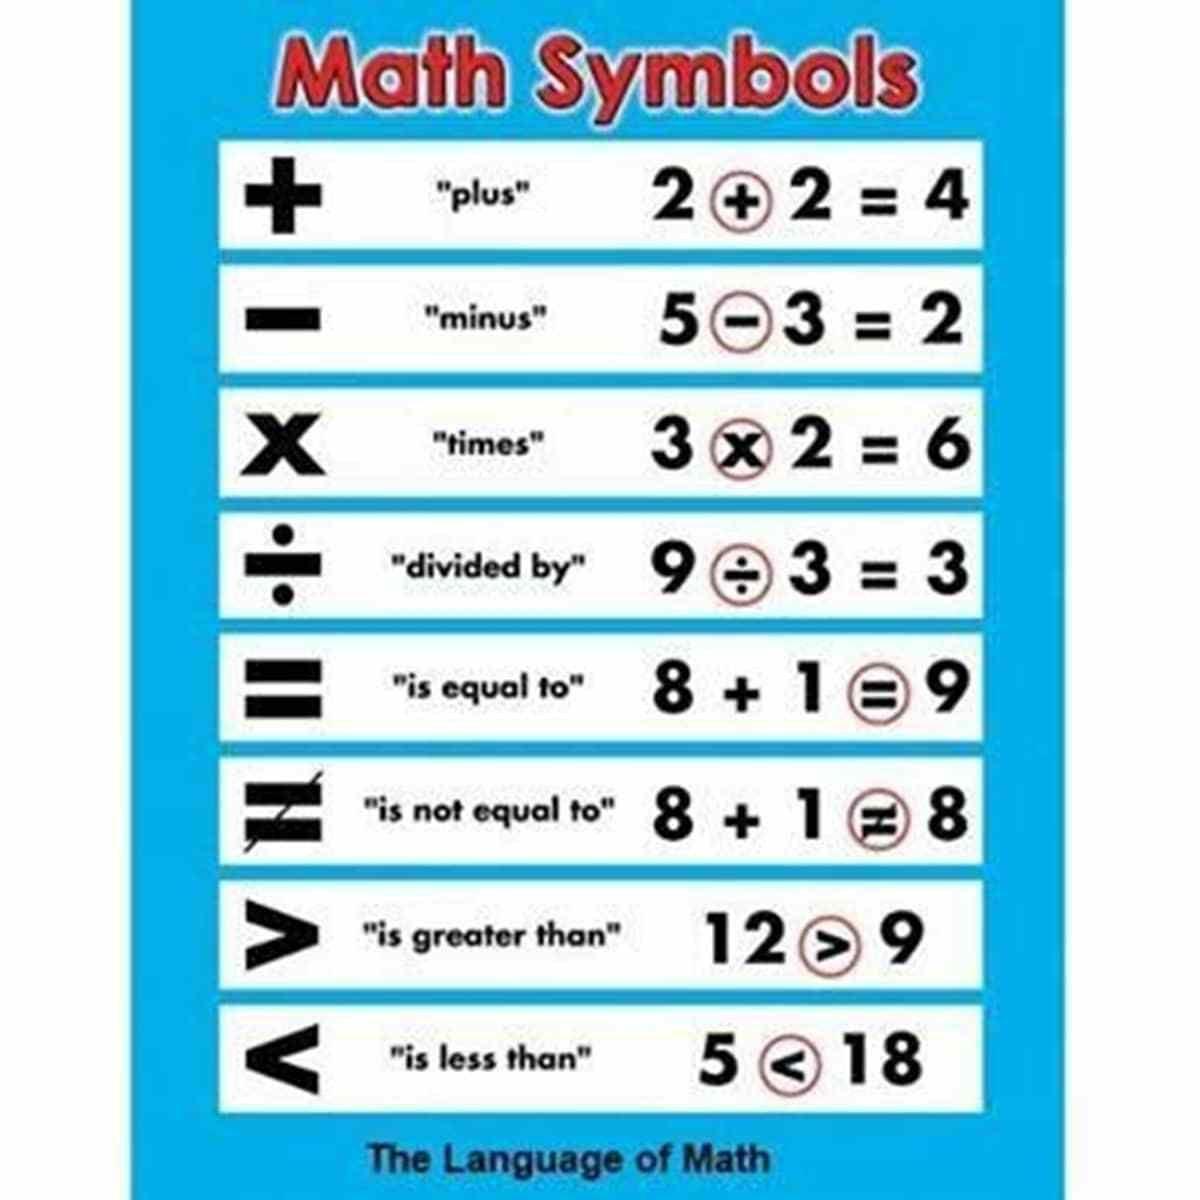 Math symbols in English | Symbols, Math and English